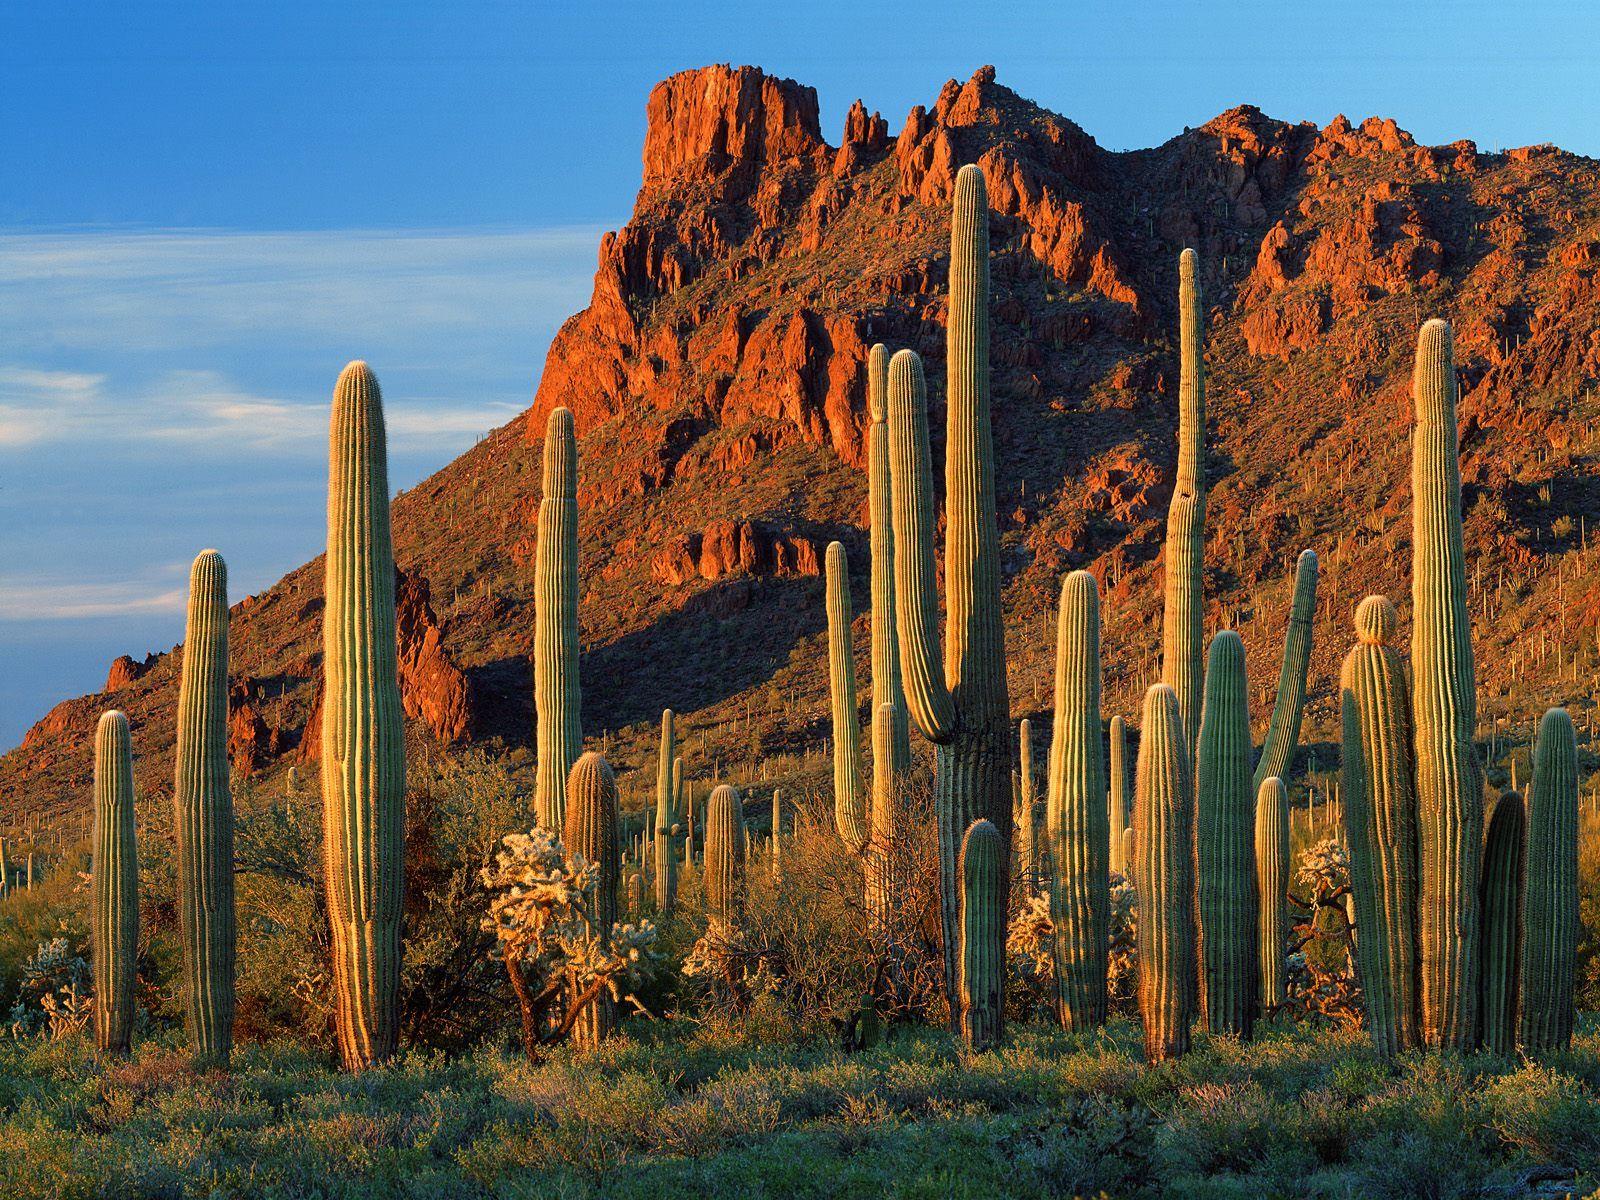 Desert Cactus HD Wallpapers Arizona cactus, Saguaro cactus